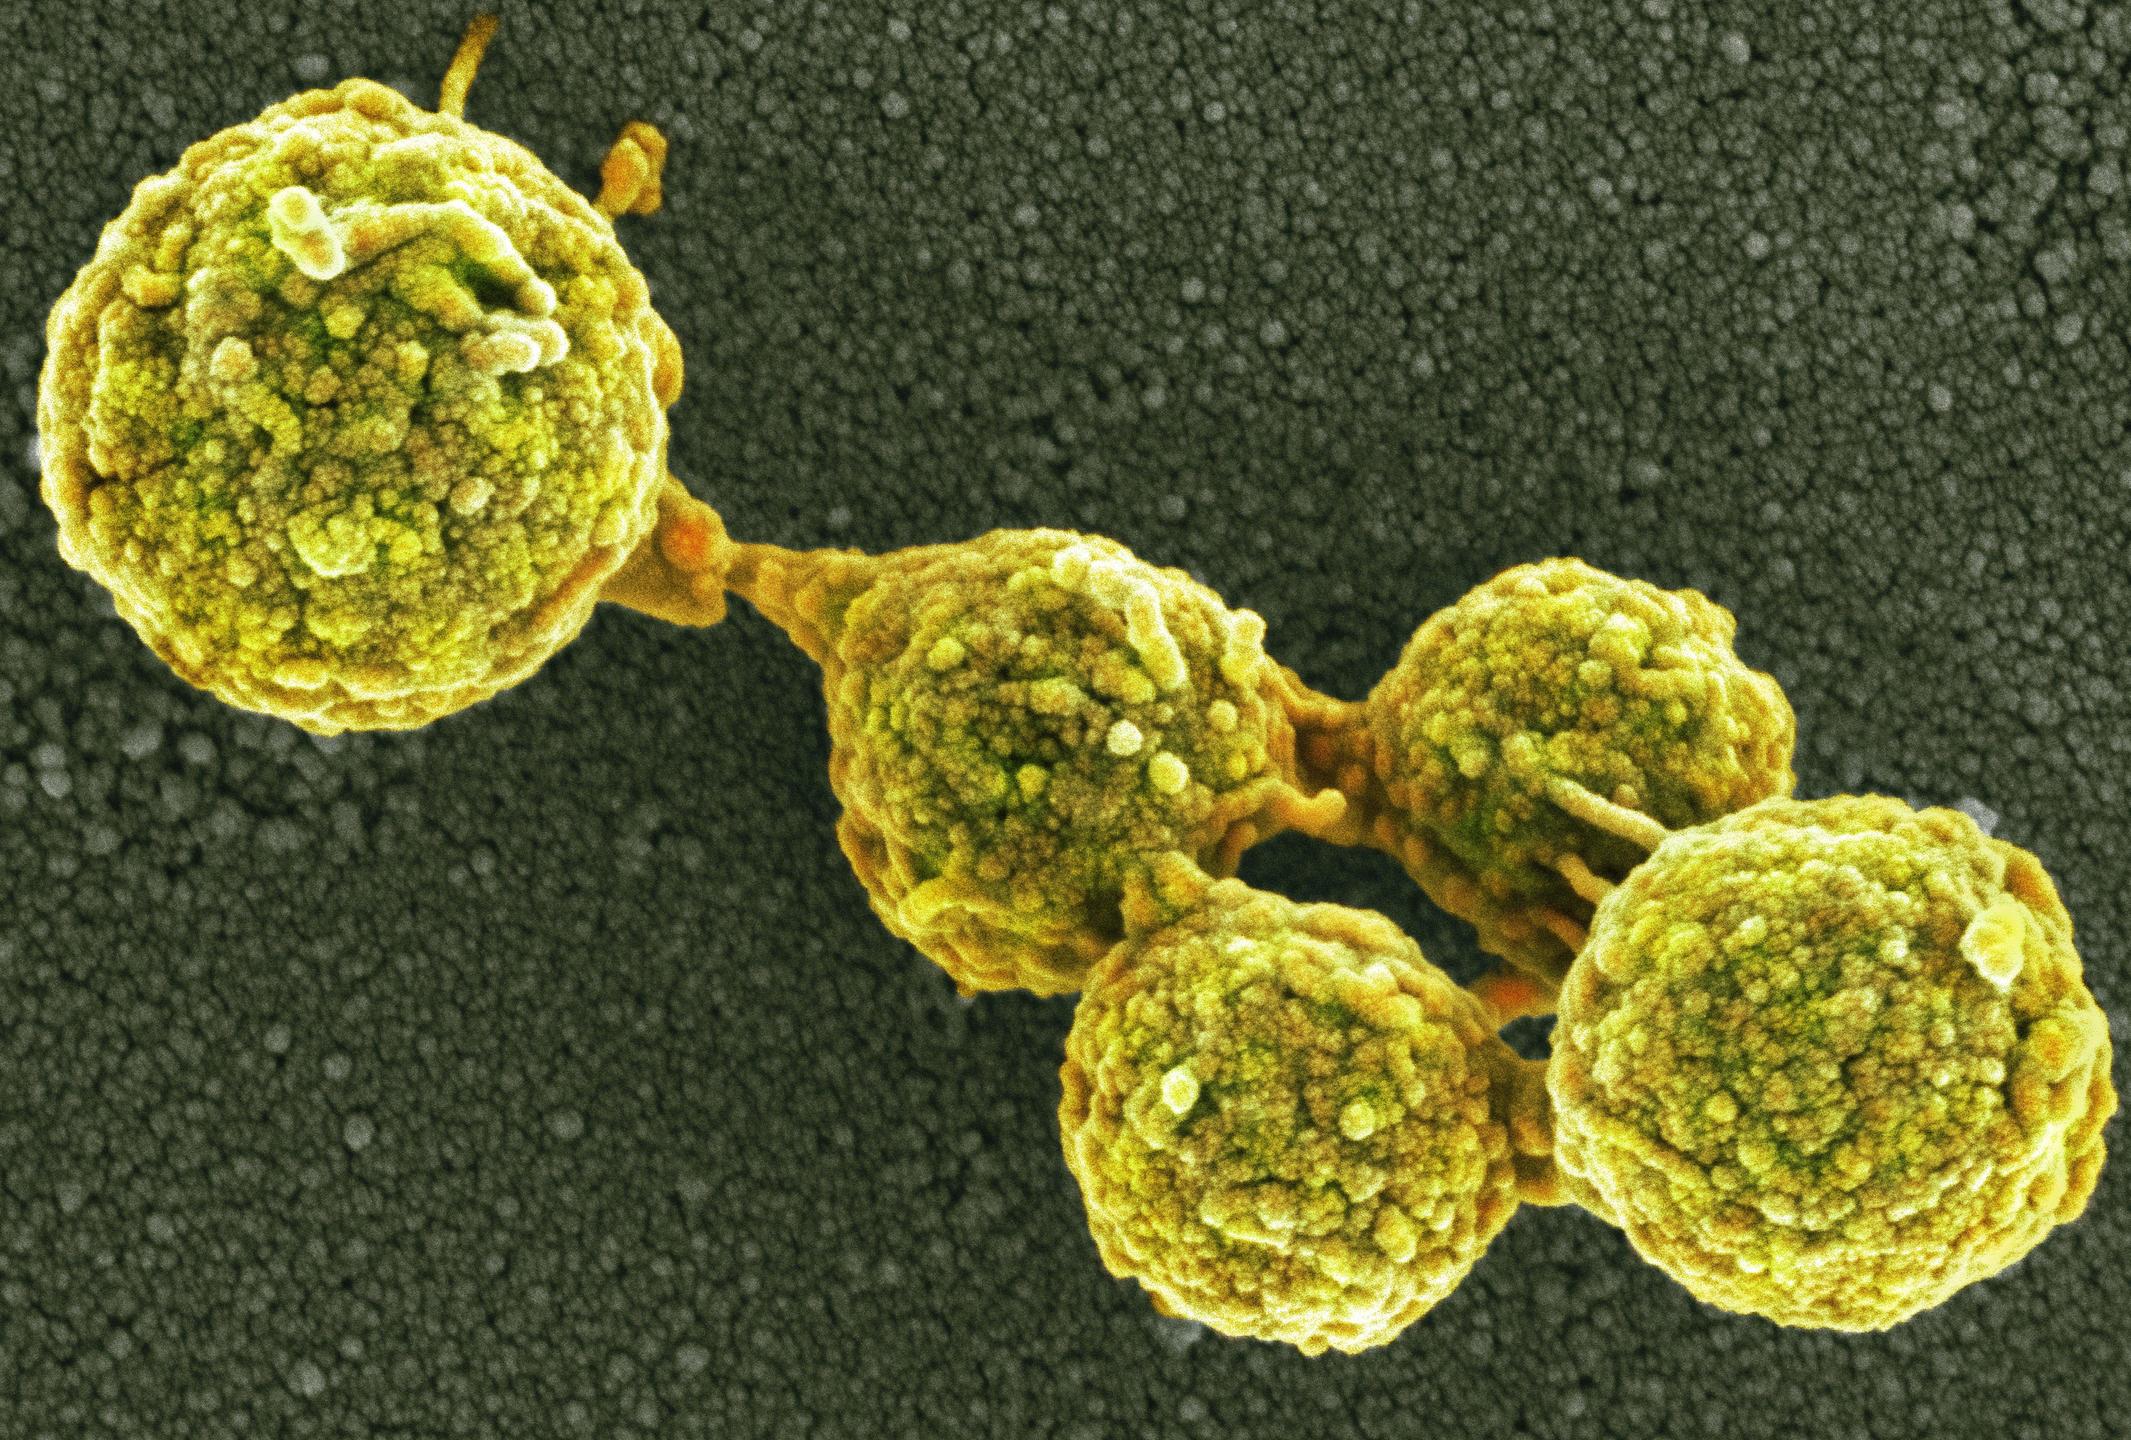 Mycoplasme synthétique